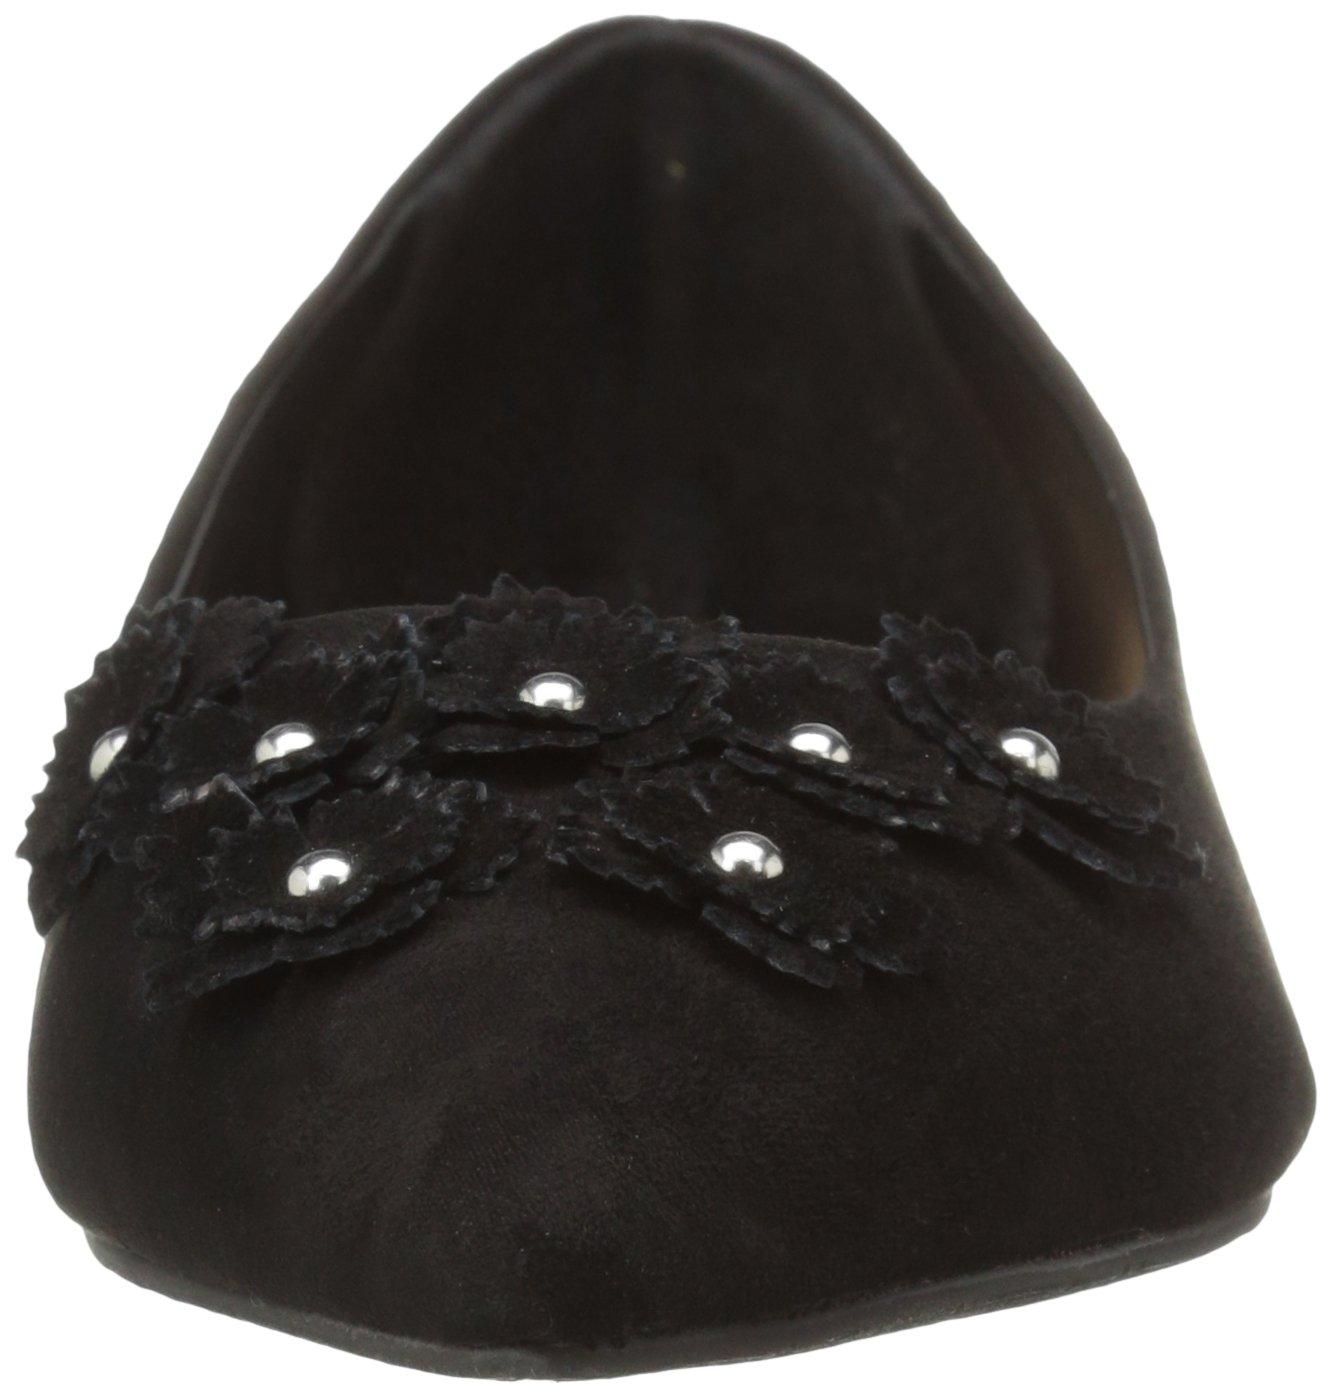 Daya by Zendaya Women's Marlow 9.5 Pointed Toe Flat B01K1J8ZJW 9.5 Marlow B(M) US|Black c9377e